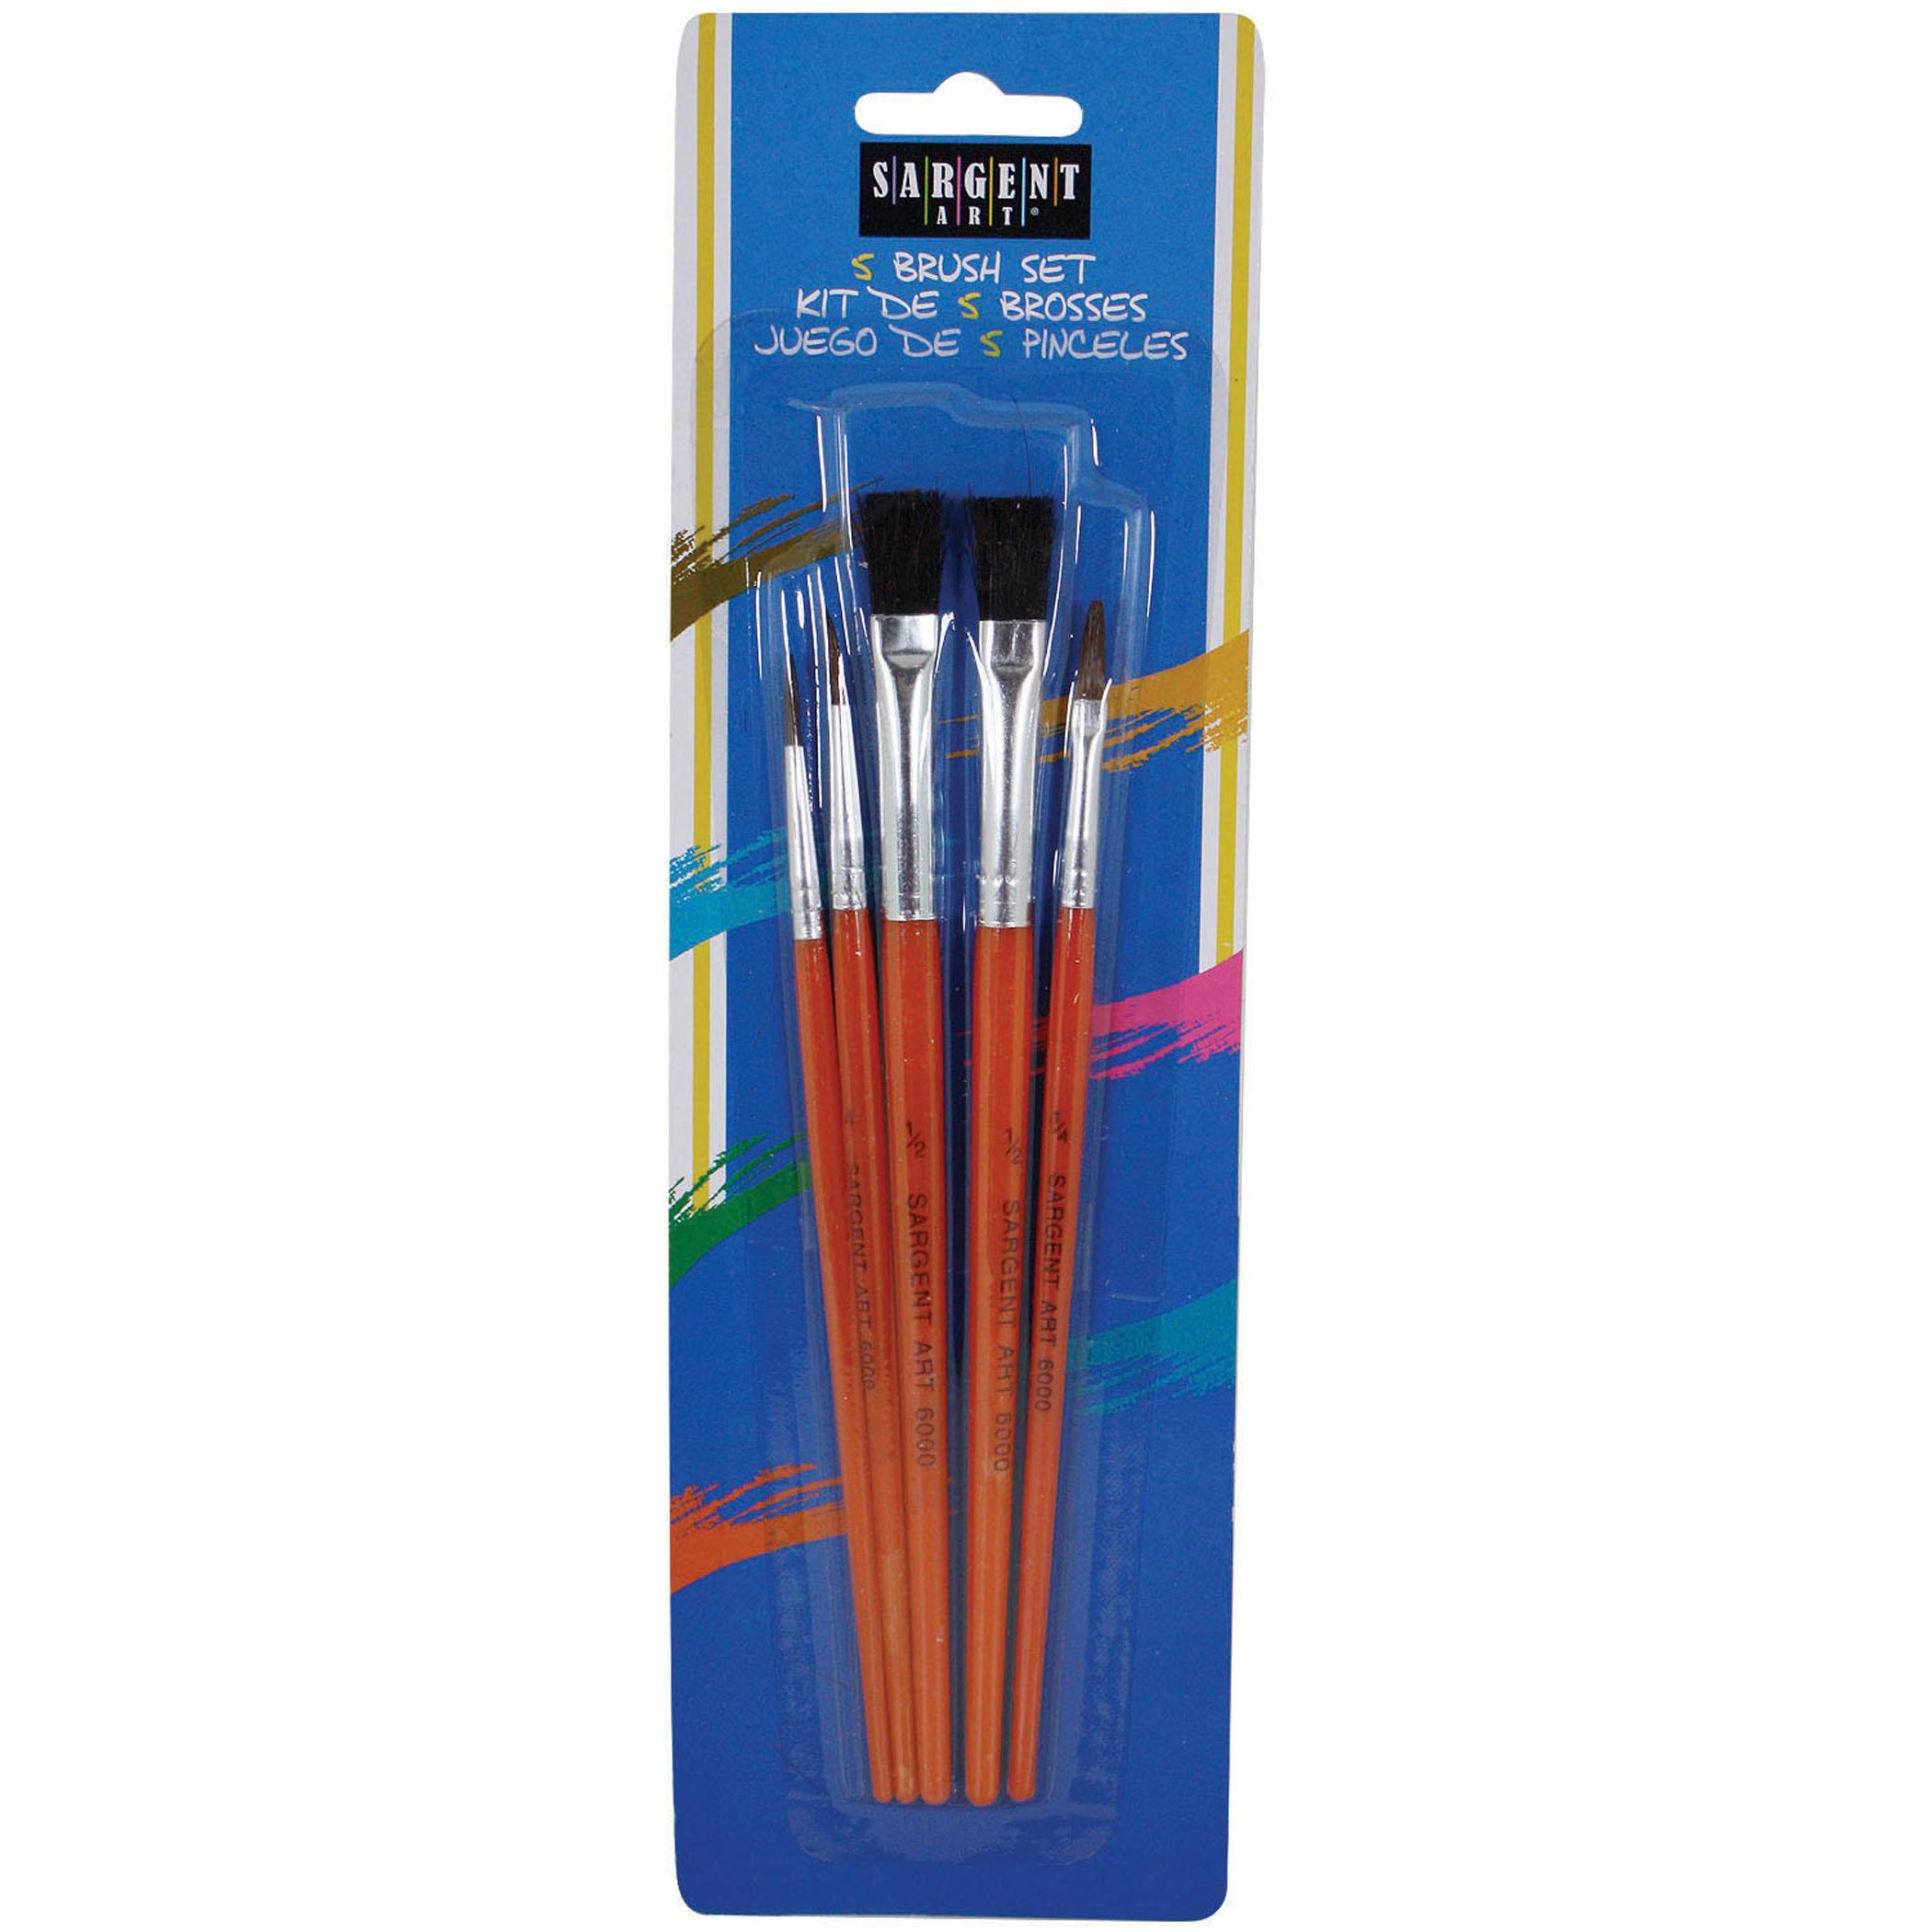 Sargent Art® All Purpose Brush Set - 5 per set, 12 sets